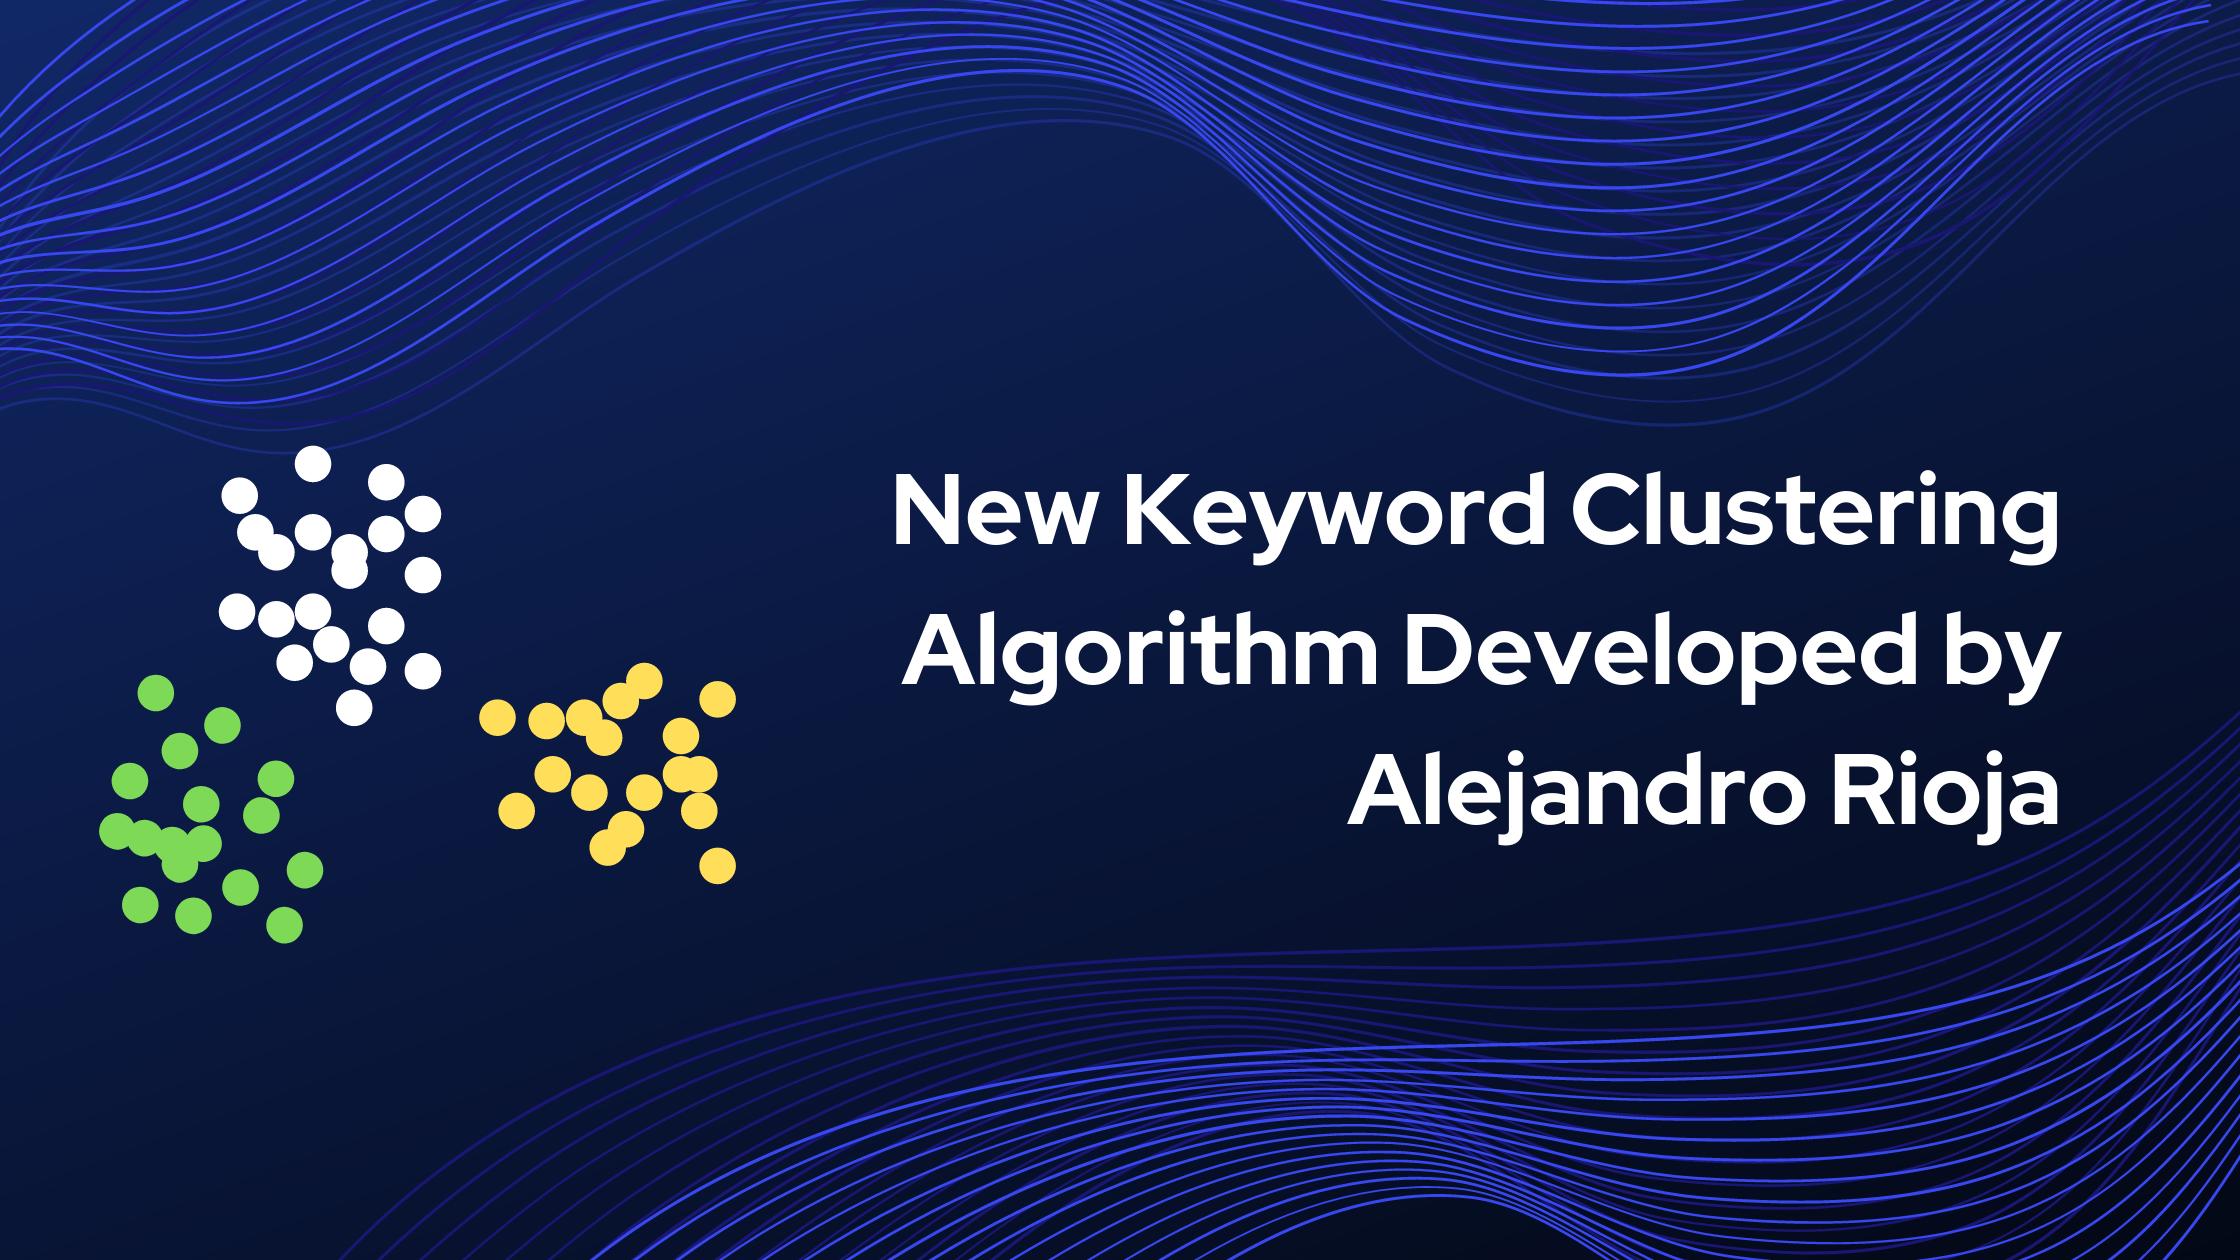 Alejandro Rioja creates a novel SEO keyword clustering algorithm using Adwords and Clearbit data